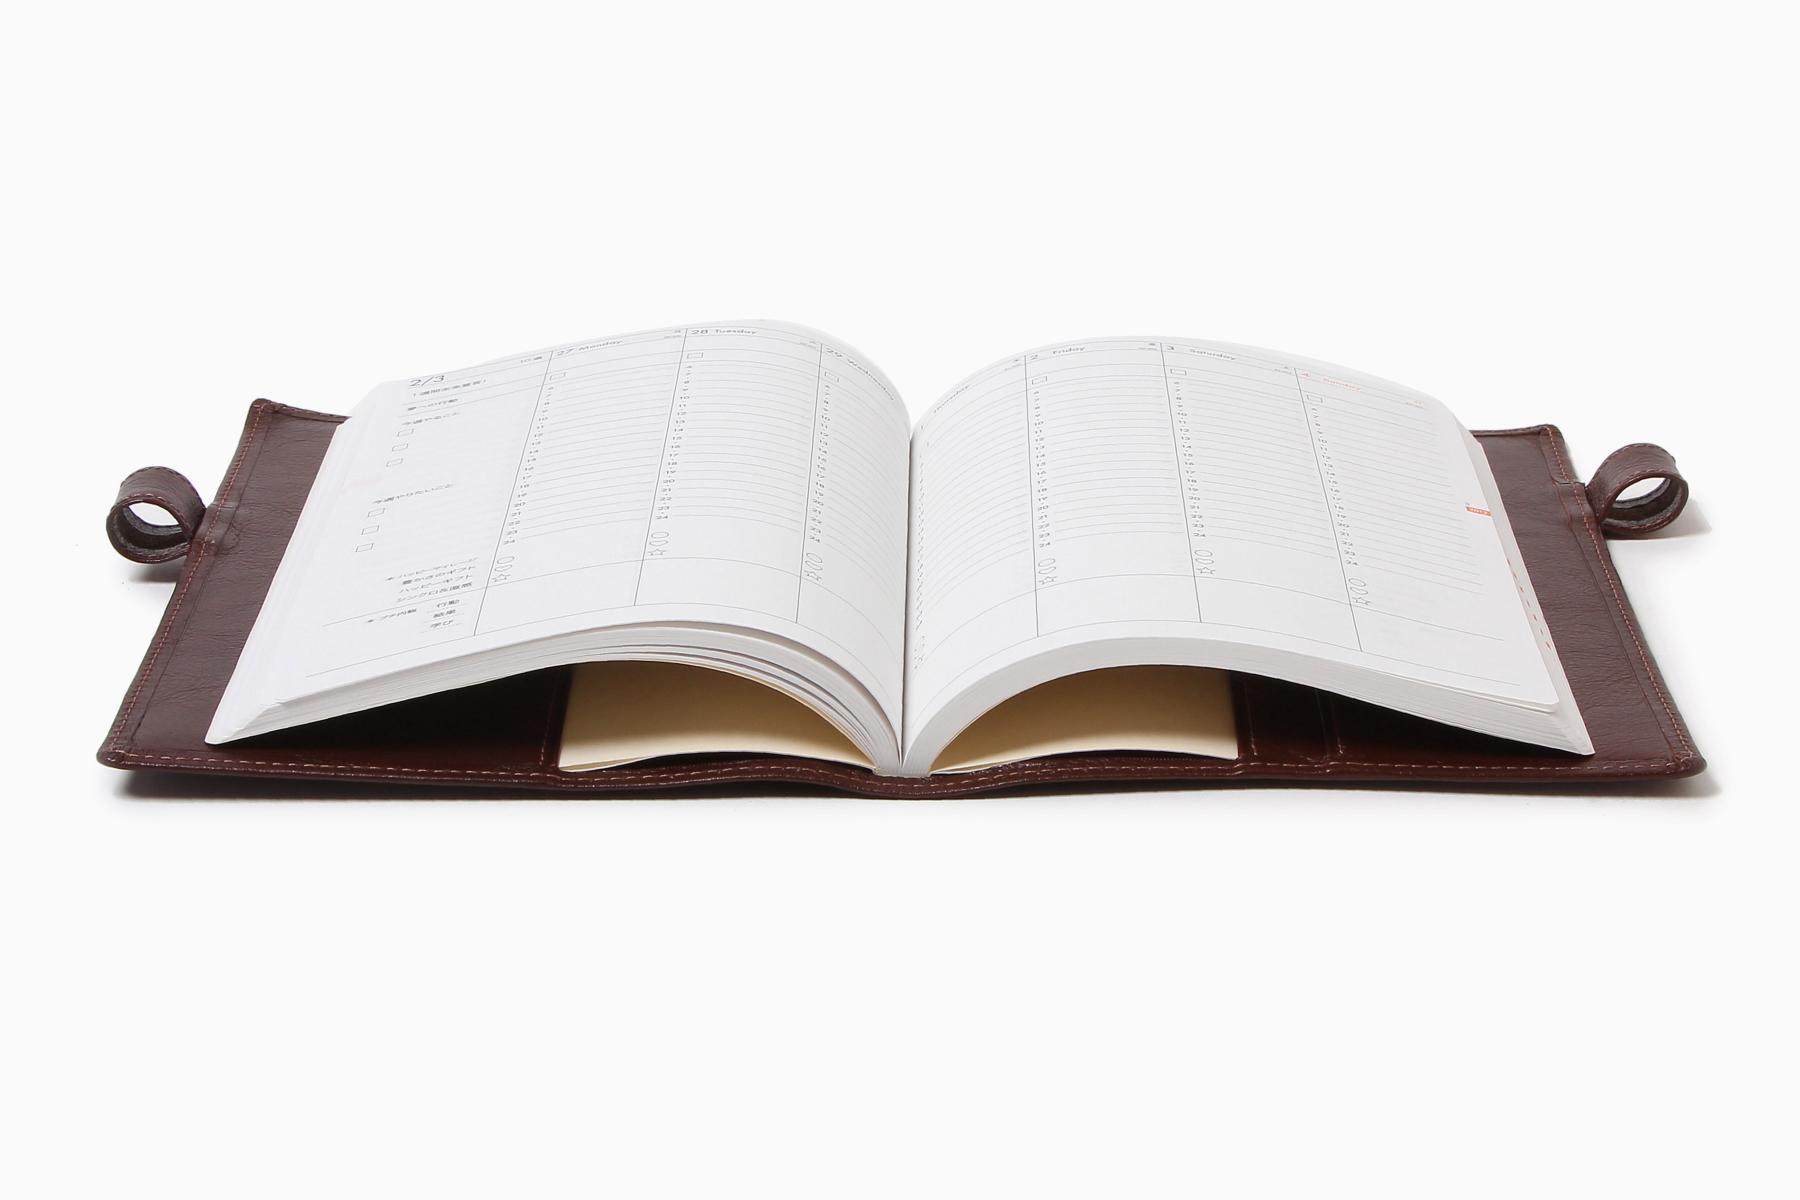 B6サイズ手帳カバー・バタフライストッパー付きを開いた状態